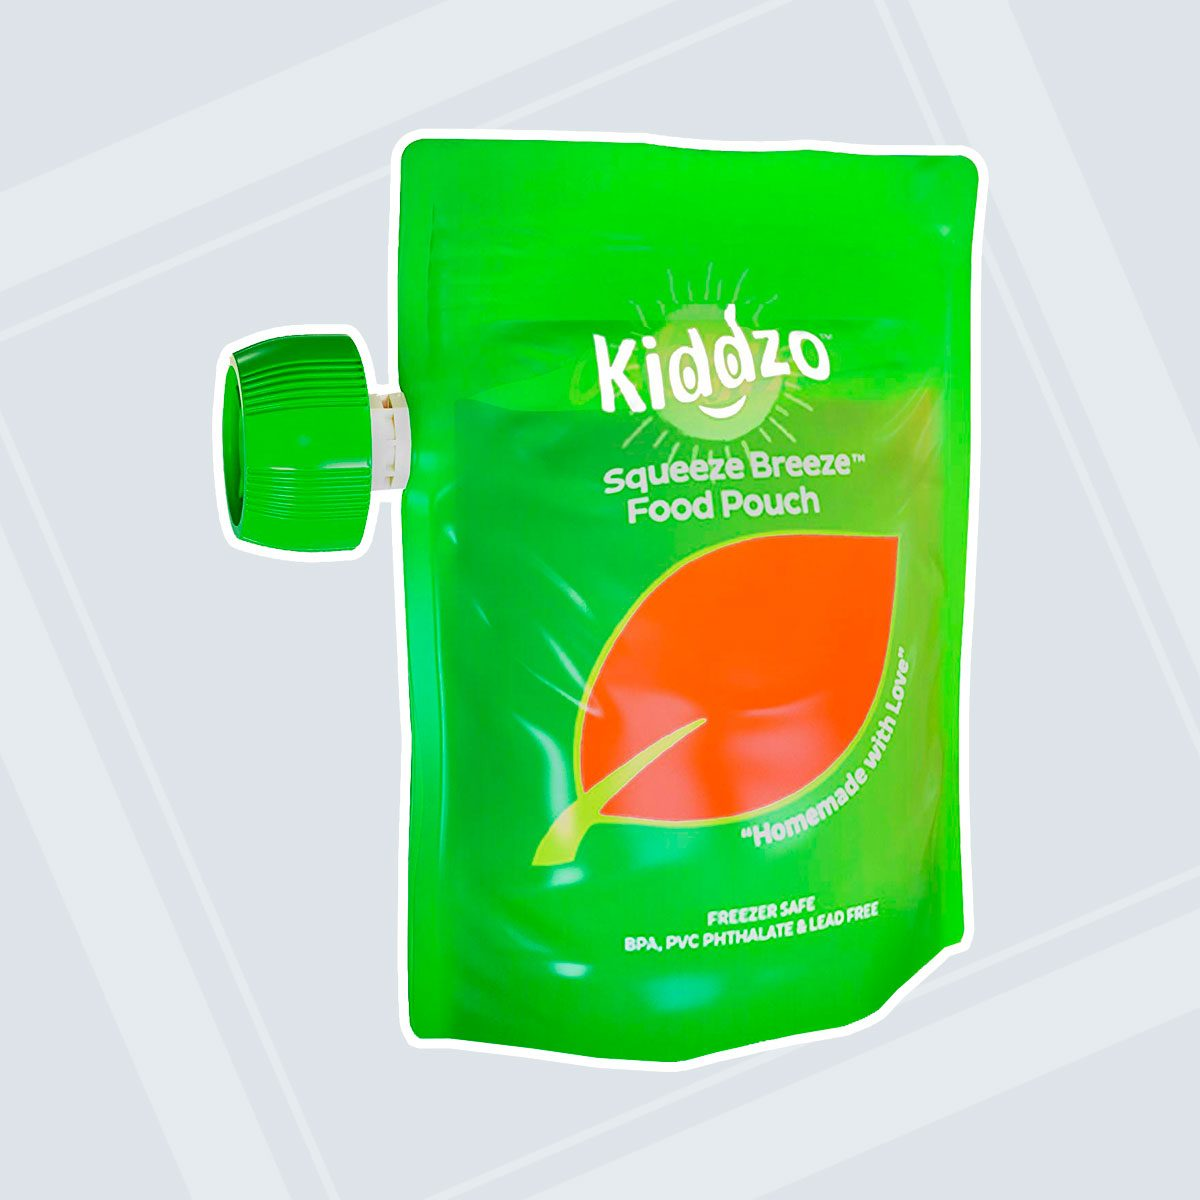 Kiddzo Food Pouches